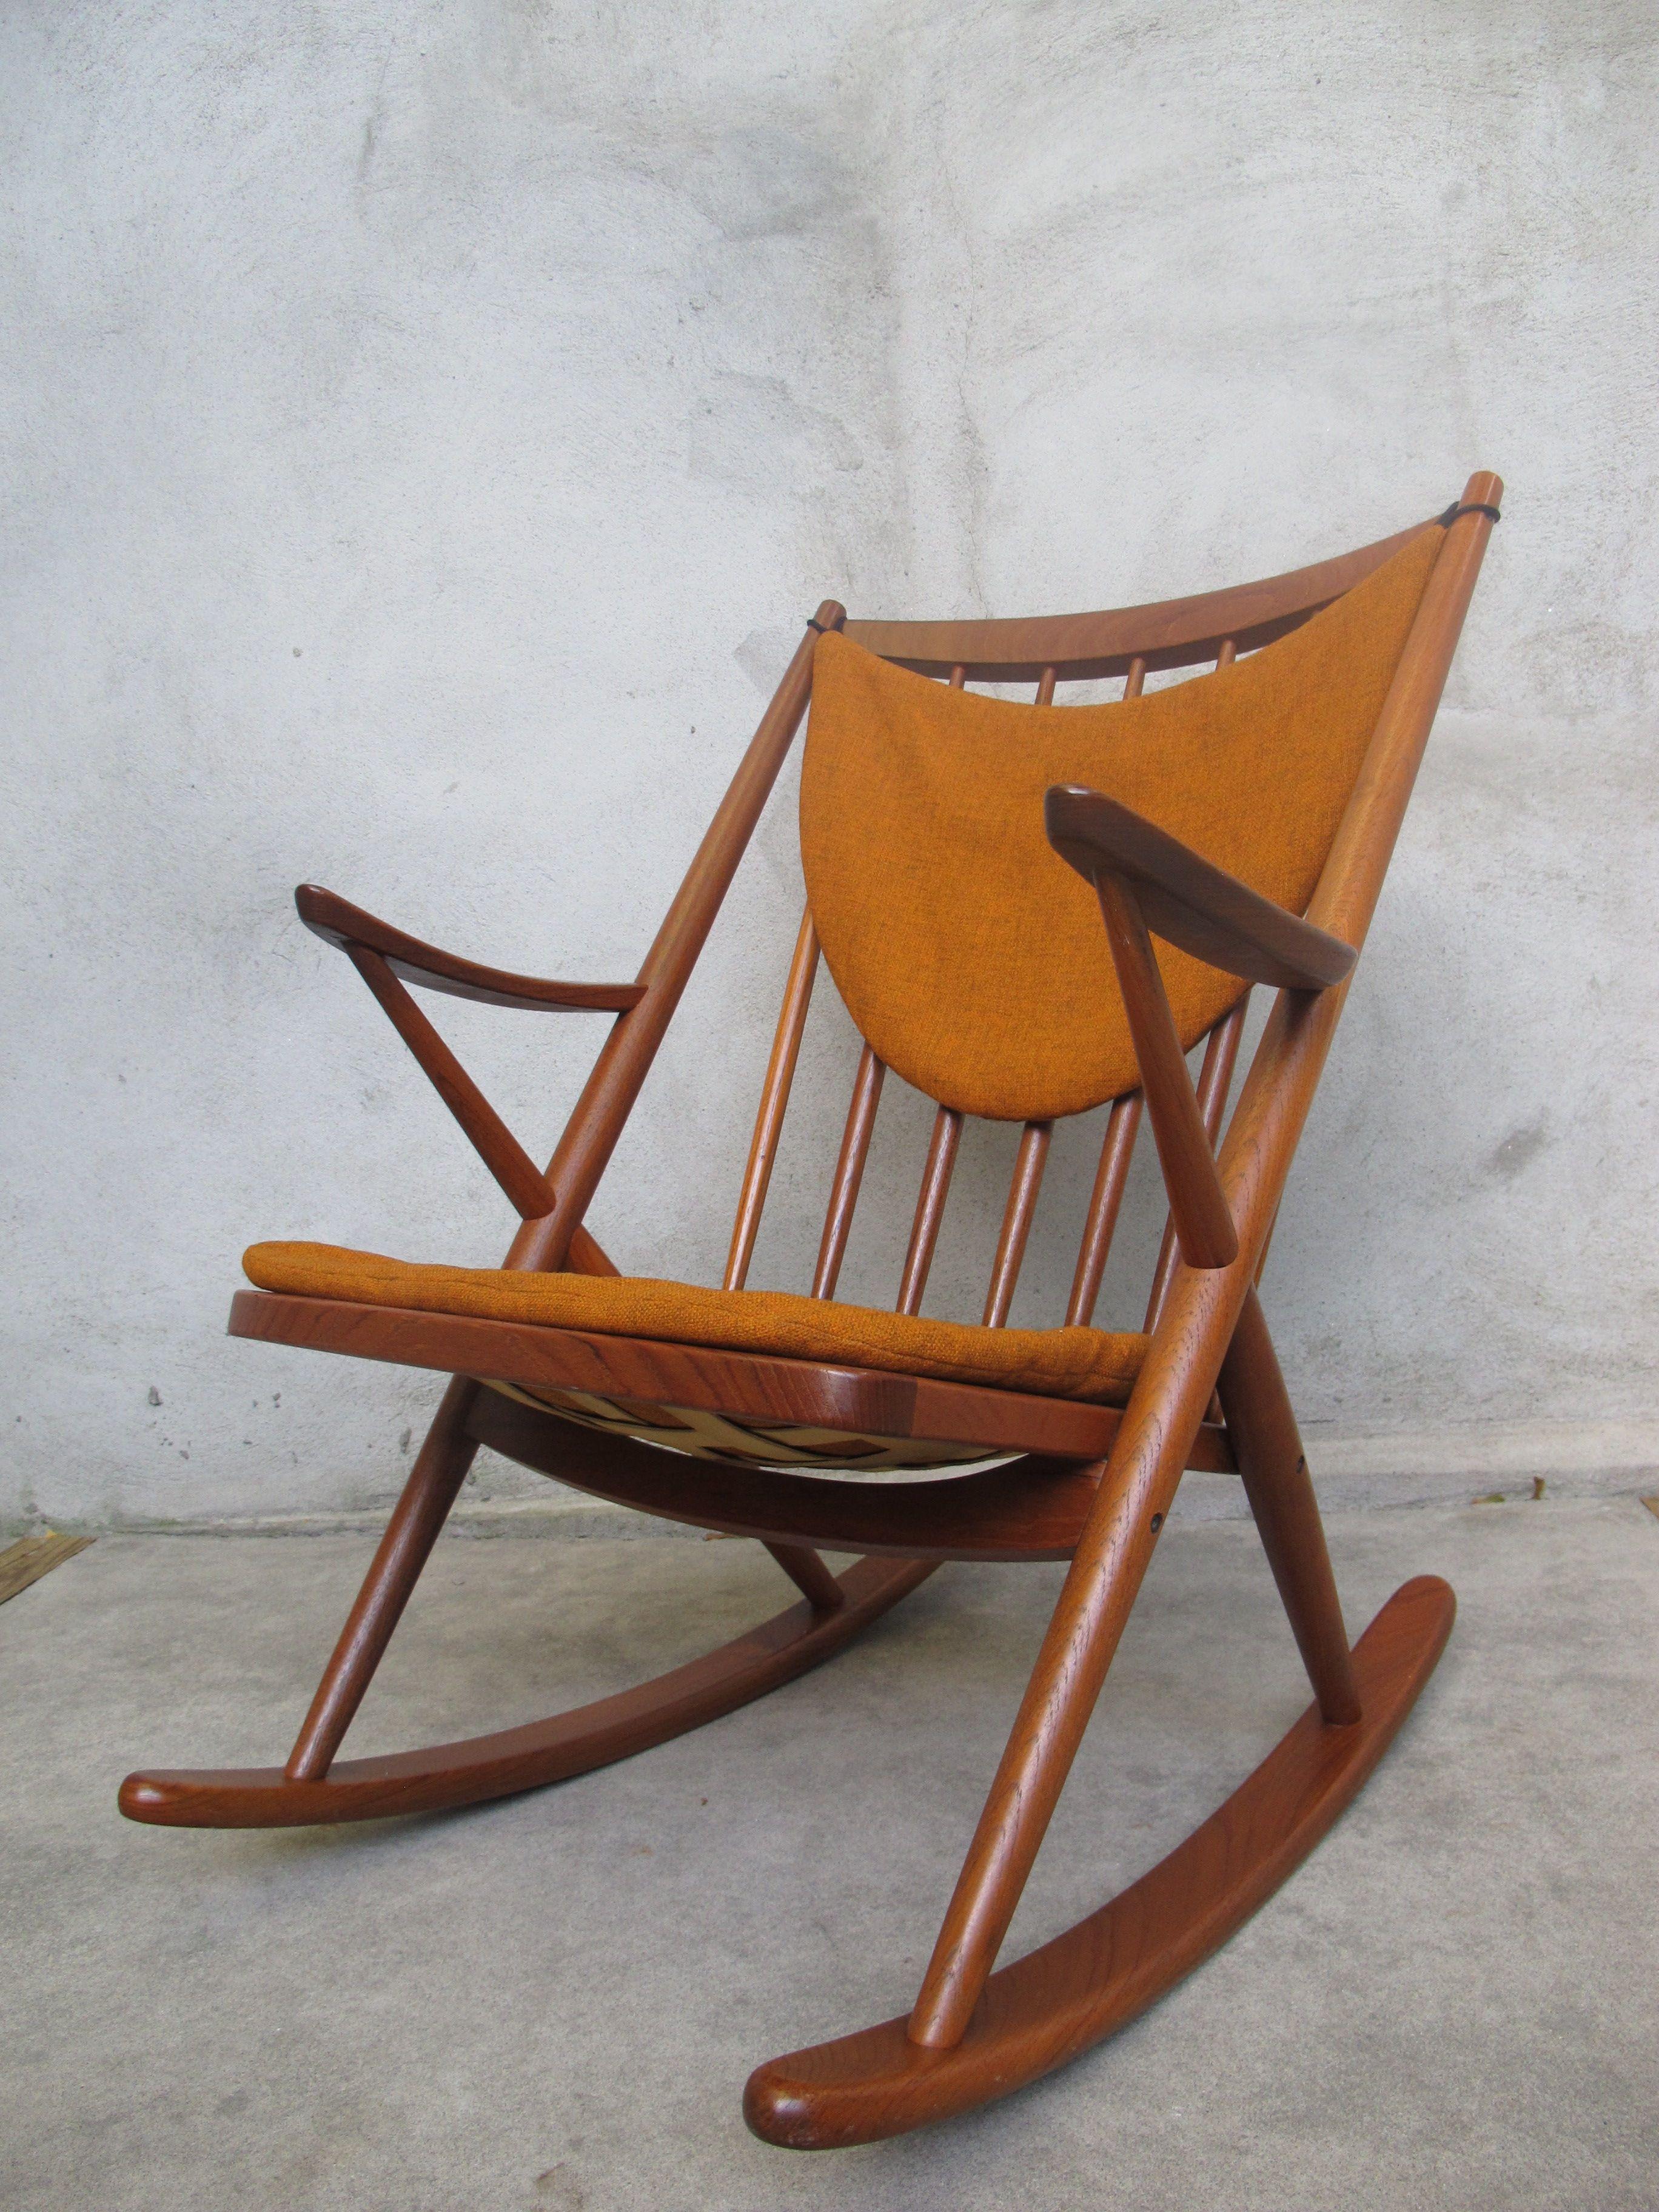 Frank reenskaug rocking chair - Bramin Danish Modern Rocking Chair By Frank Reenskaug